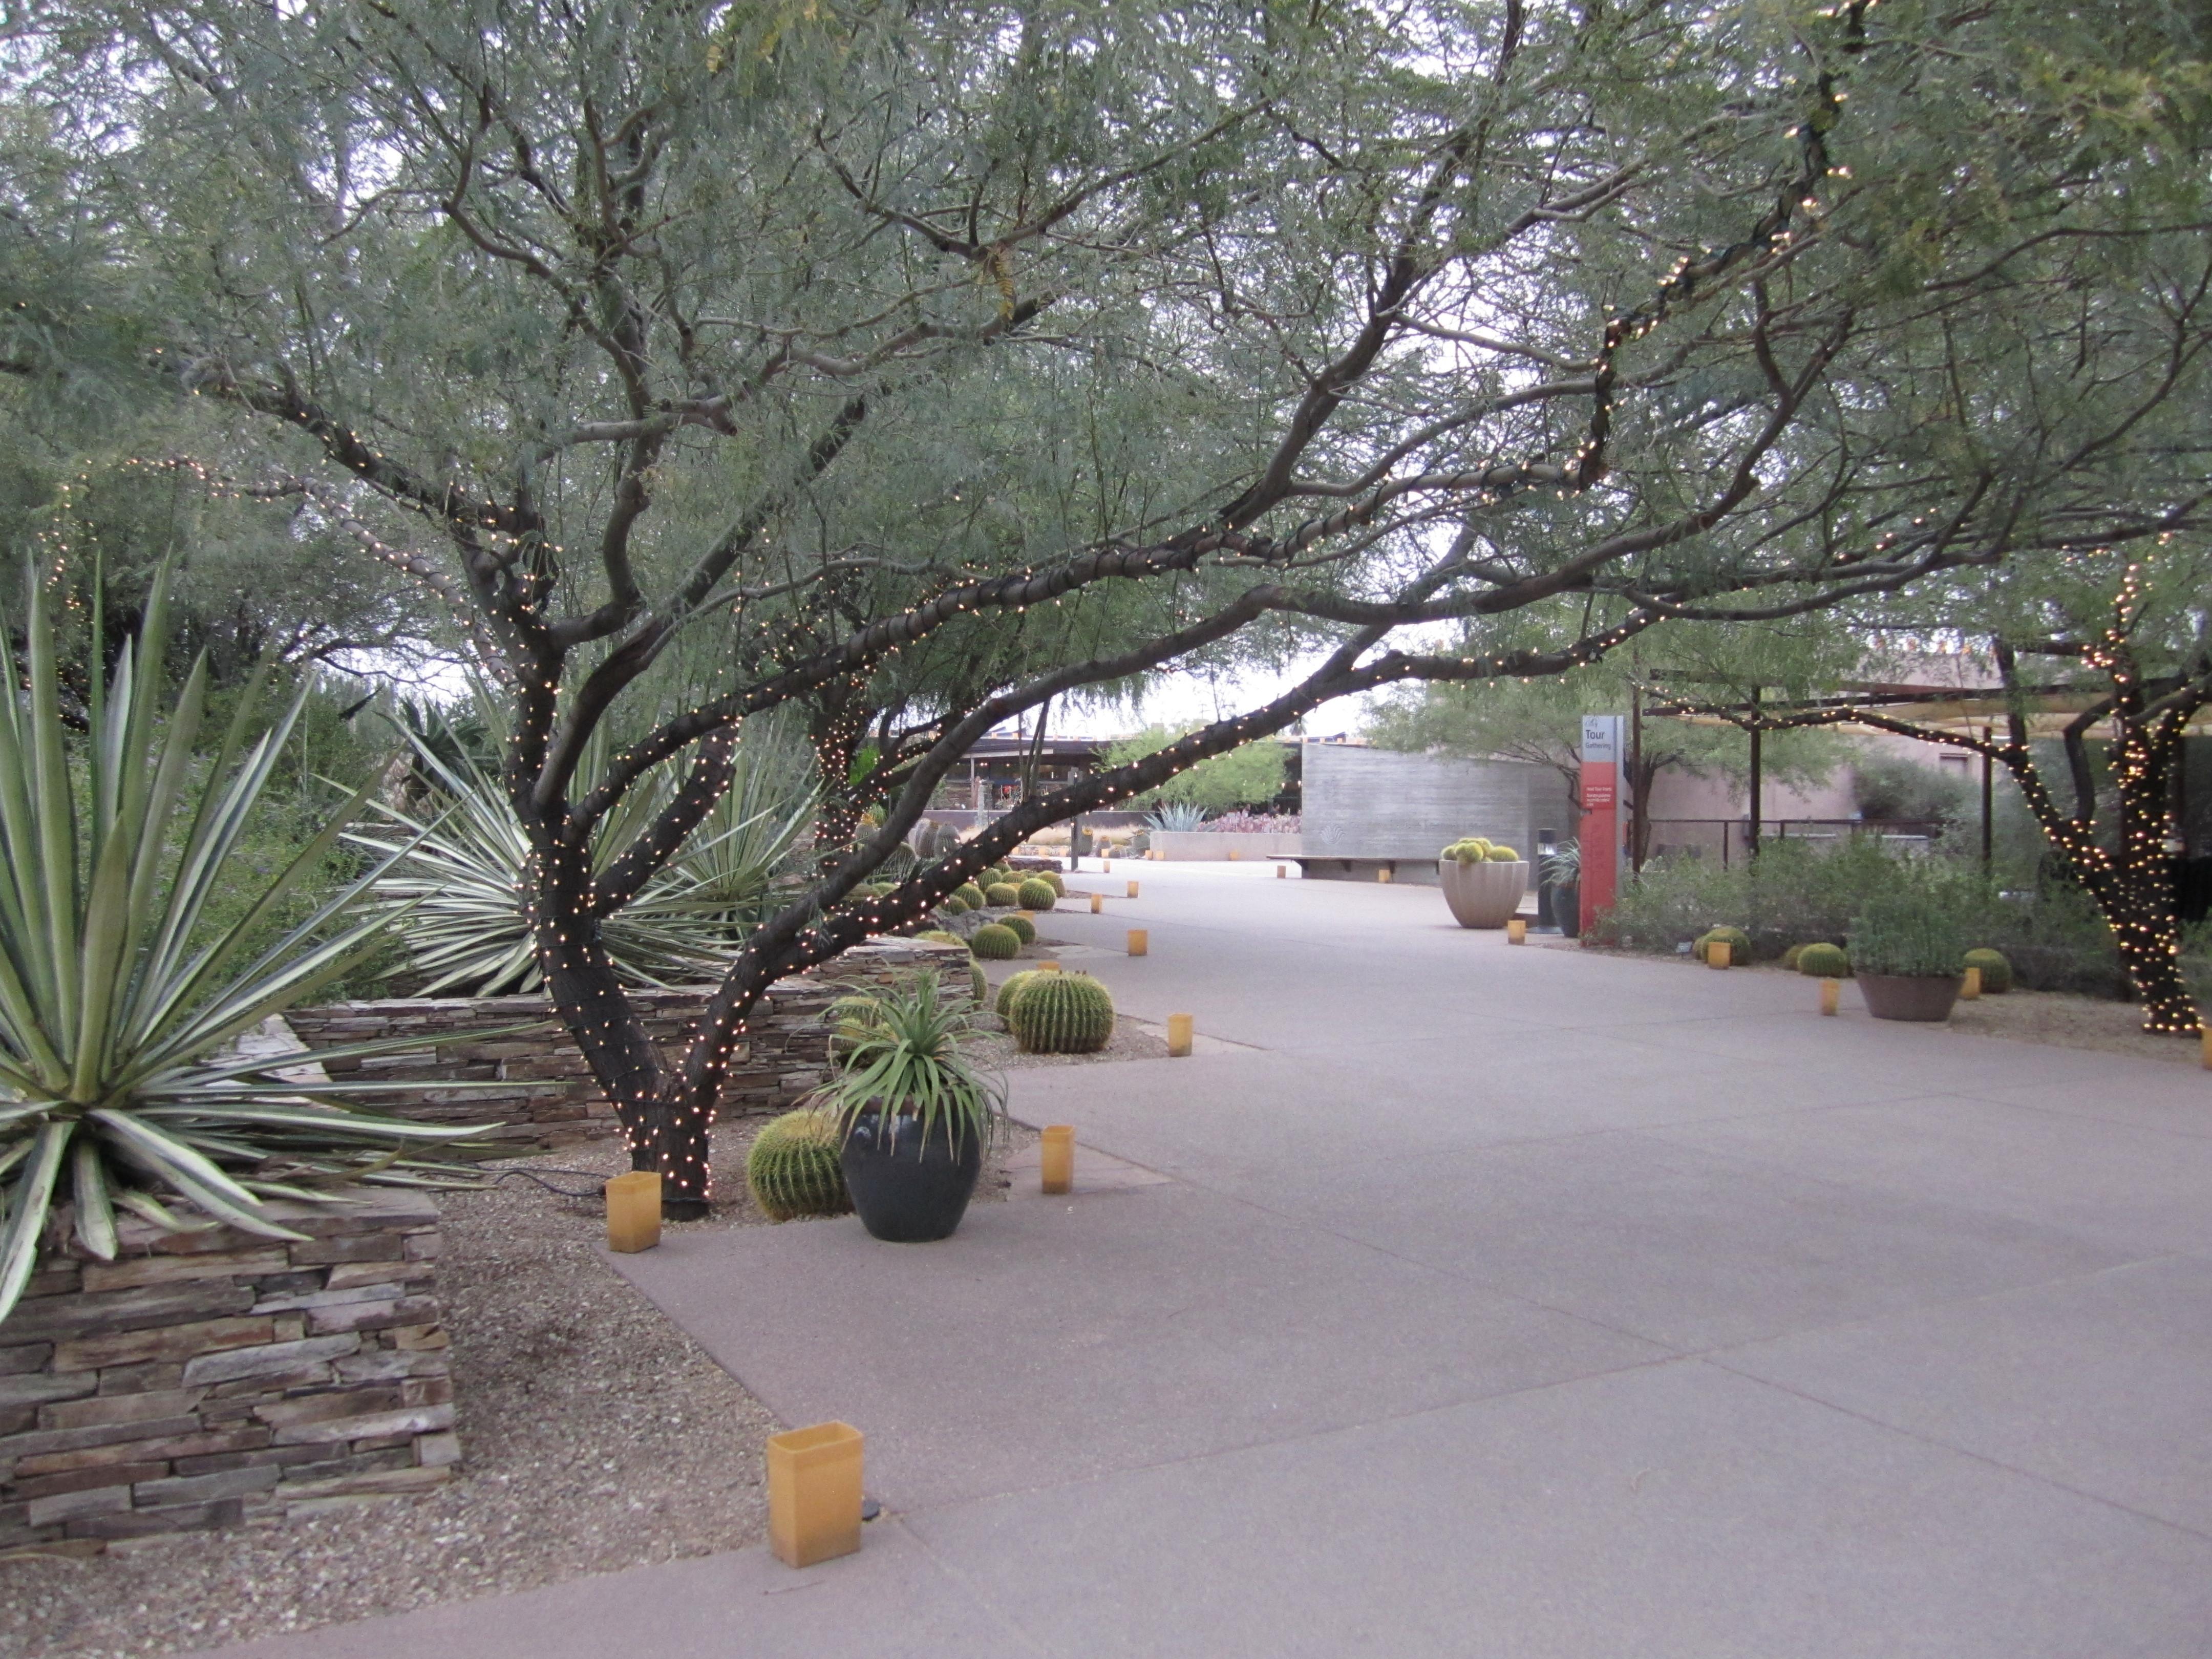 Desert Botanical Gardens Luminarias Tempe Tourism Tempe Events This Week Las Noches De Las